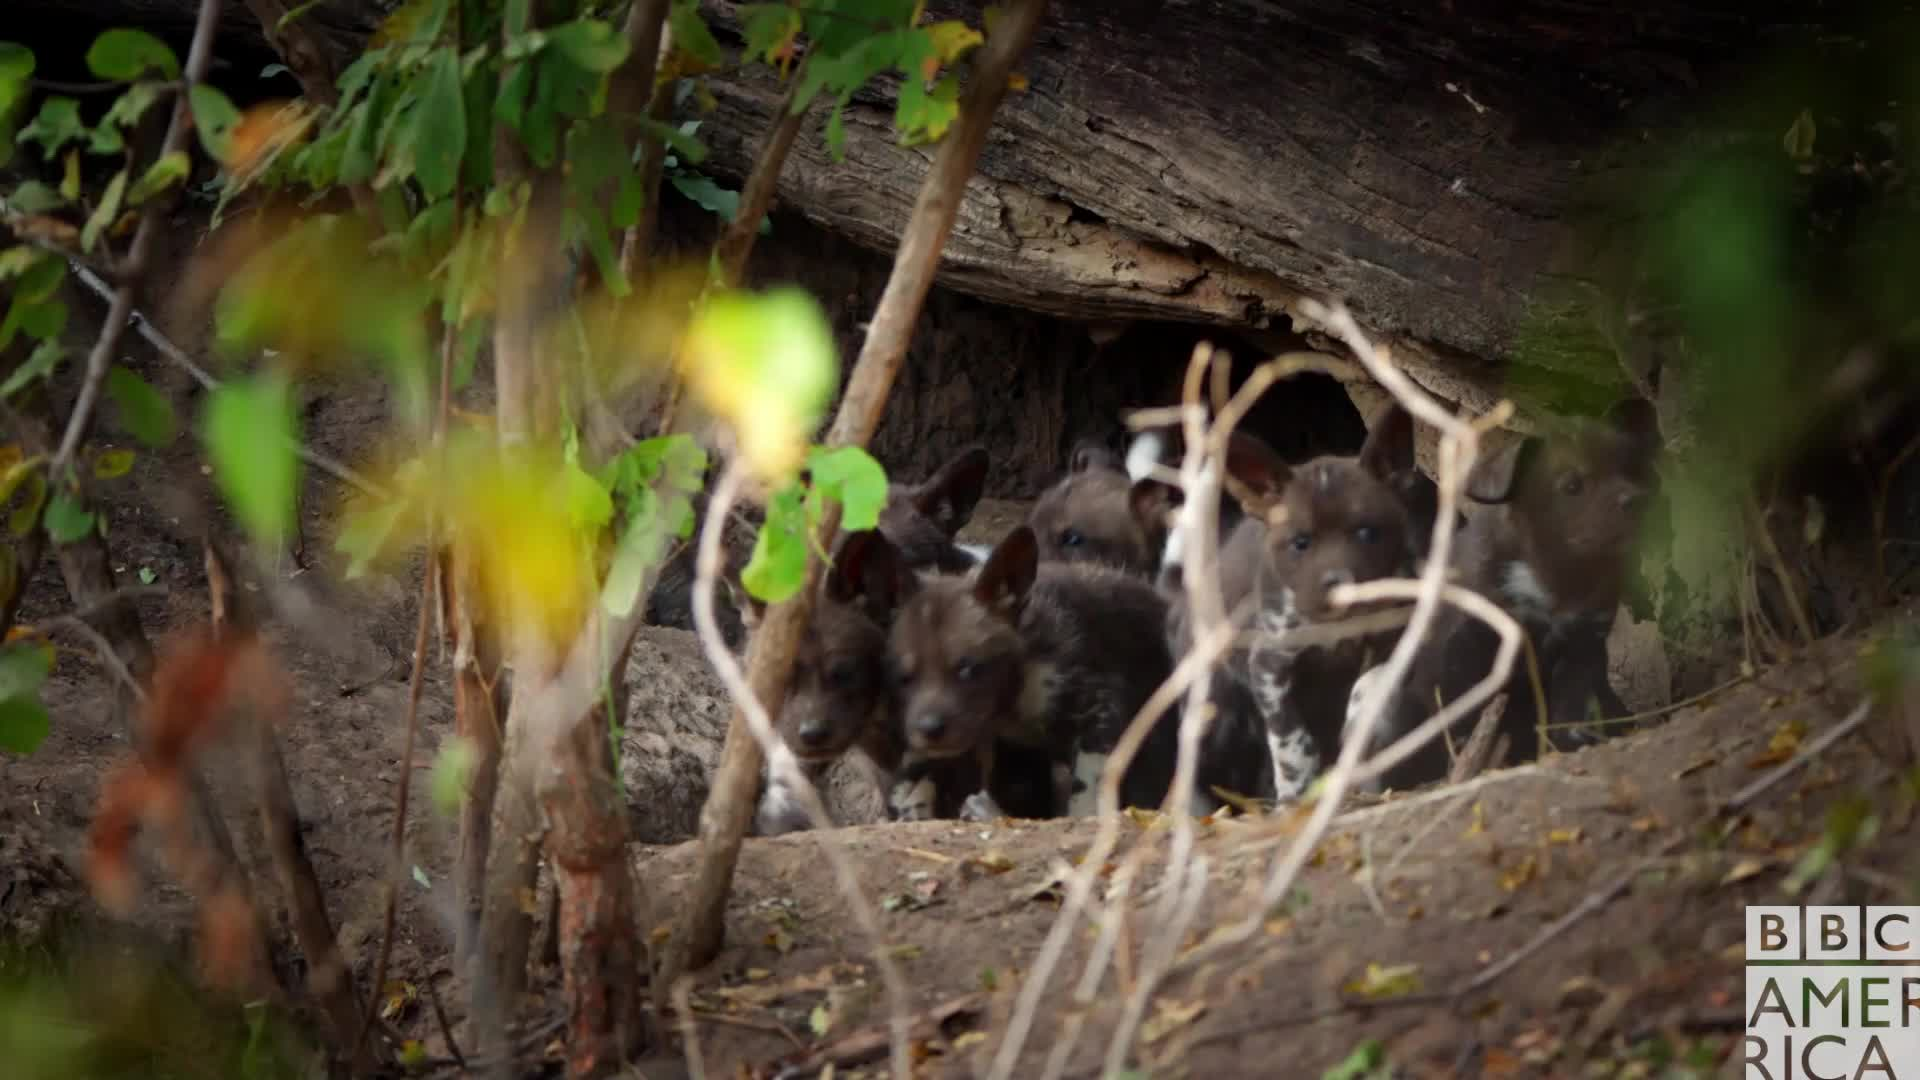 animal, animals, awww, bbc america, bbc america dynasties, bbc america: dynasties, cute, dynasties, painted wolf, painted wolves, puppies, wolf, wolves, Dynasties Seven Wolf Puppies GIFs